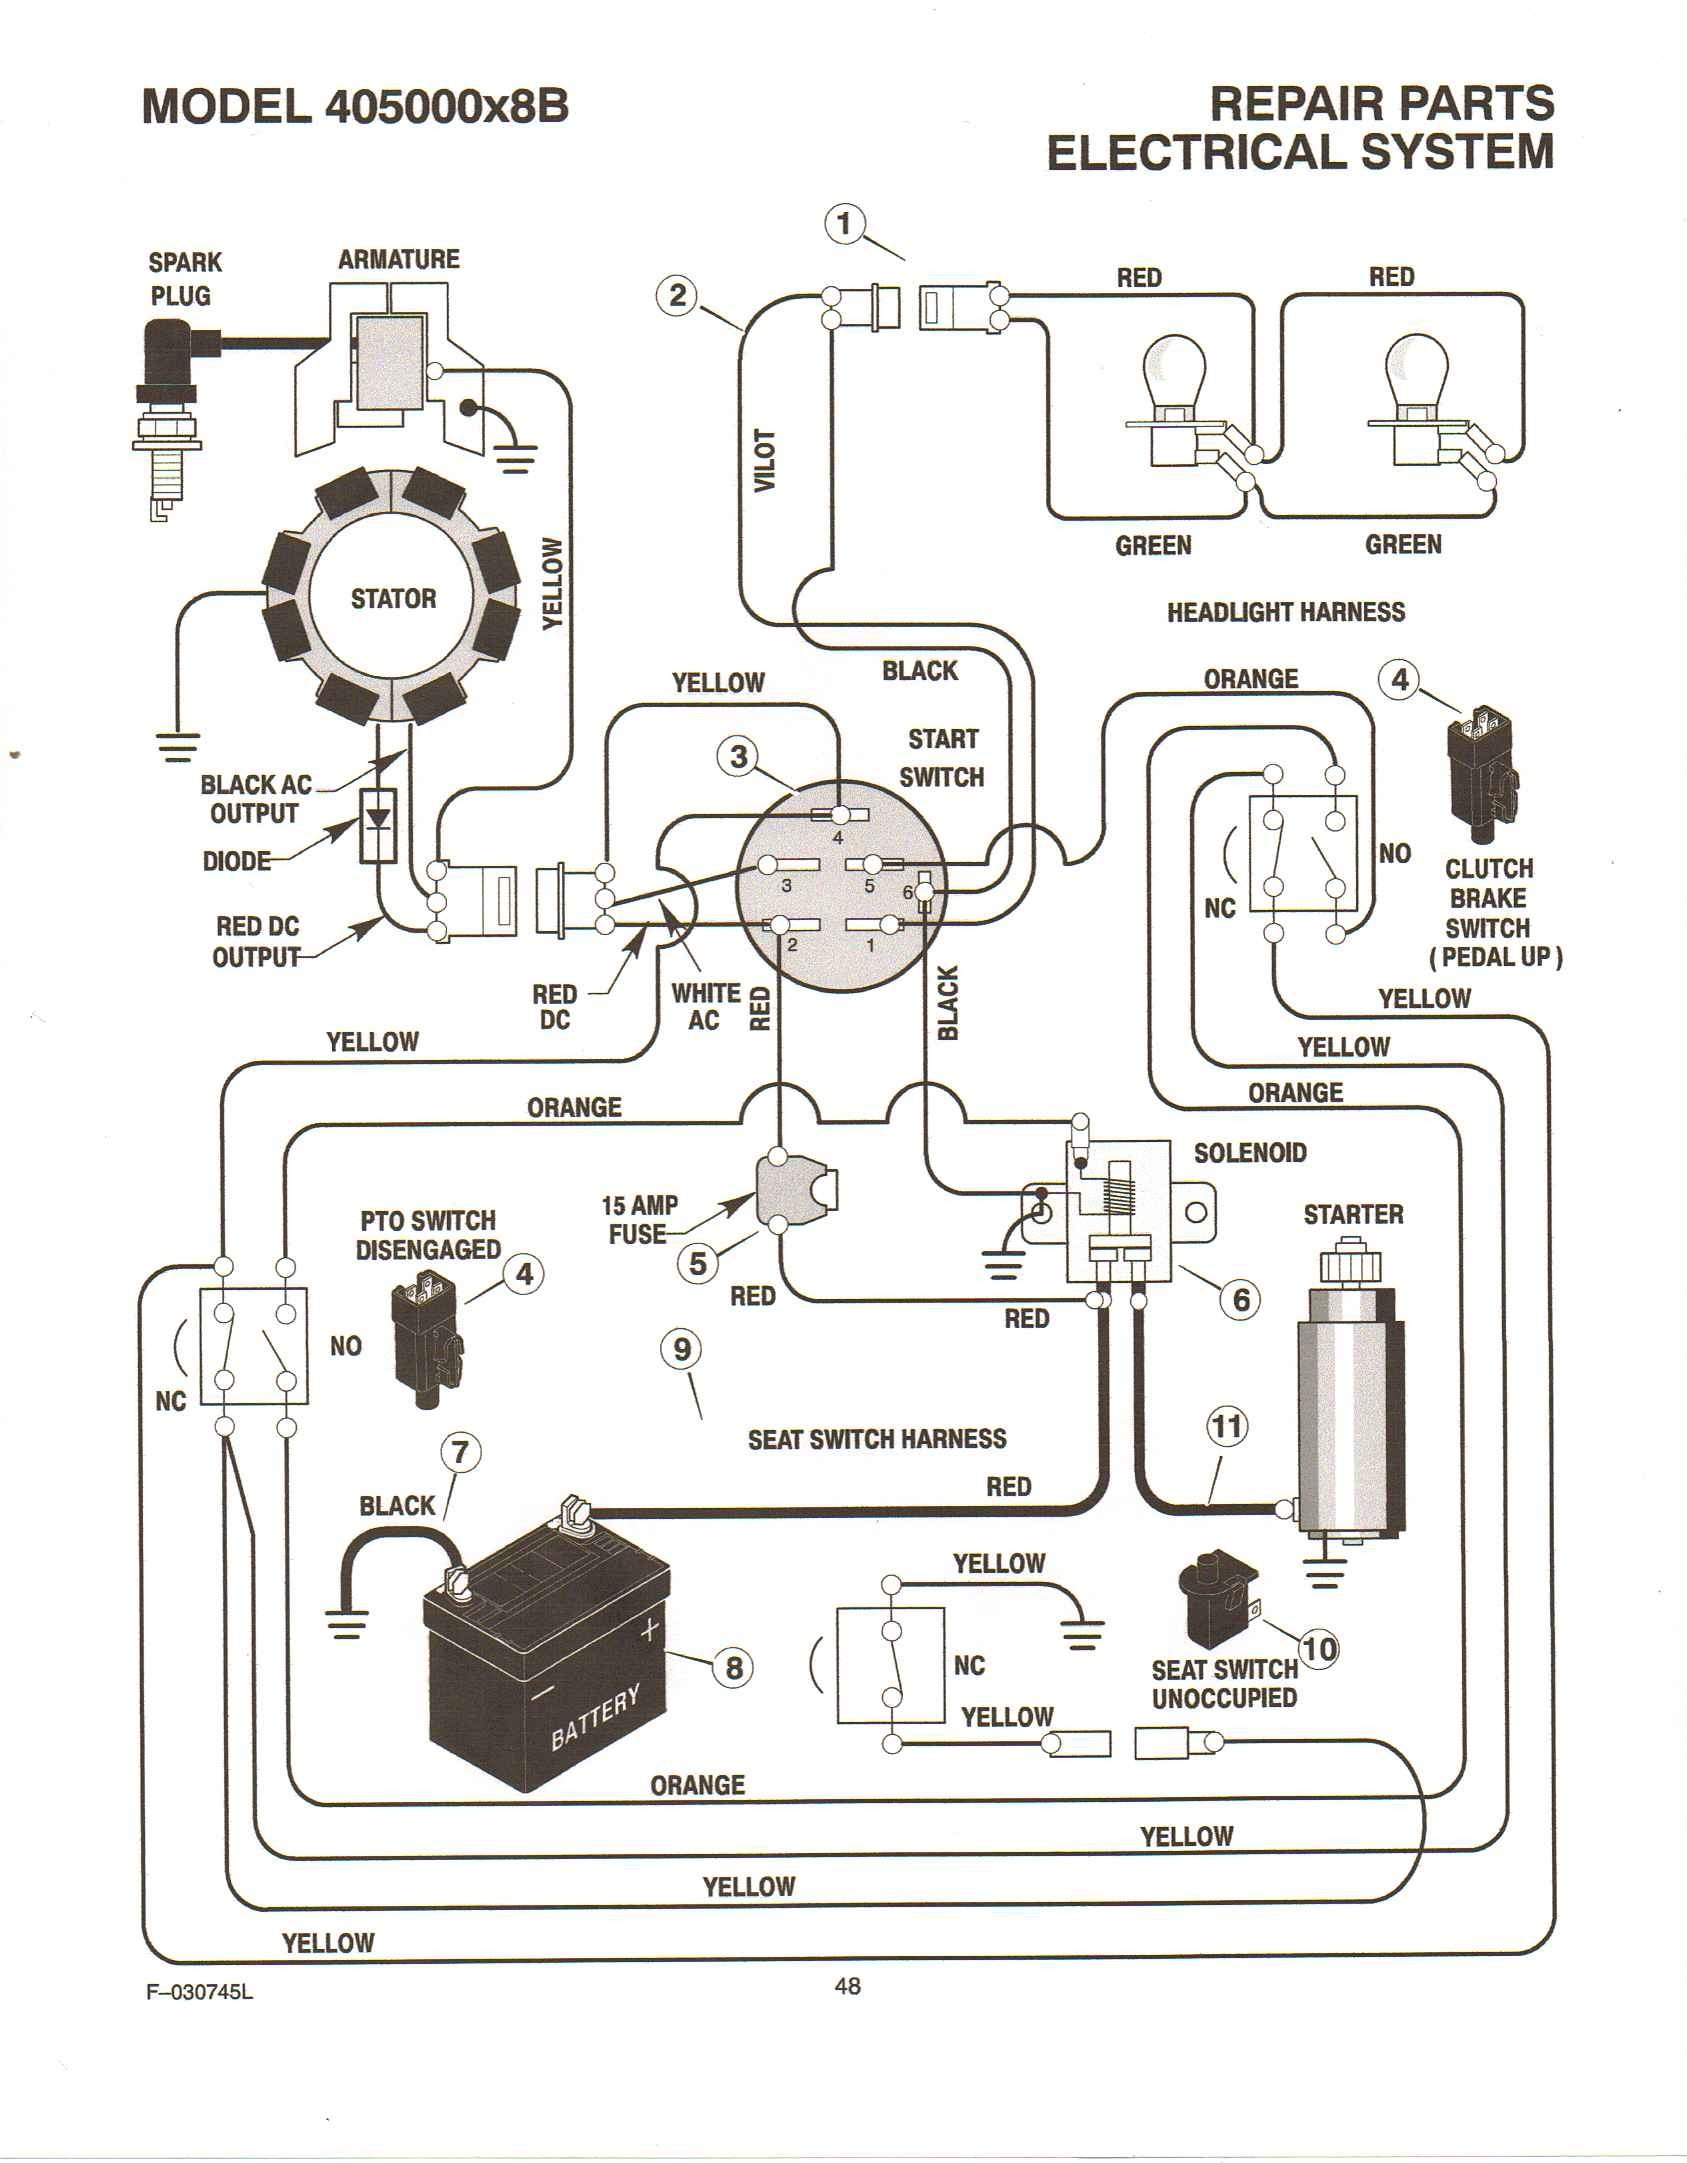 Starter solenoid Wiring Diagram Manual Inspirationa Epic Wiring Diagram for Kohler Engine 58 for Starter Motor